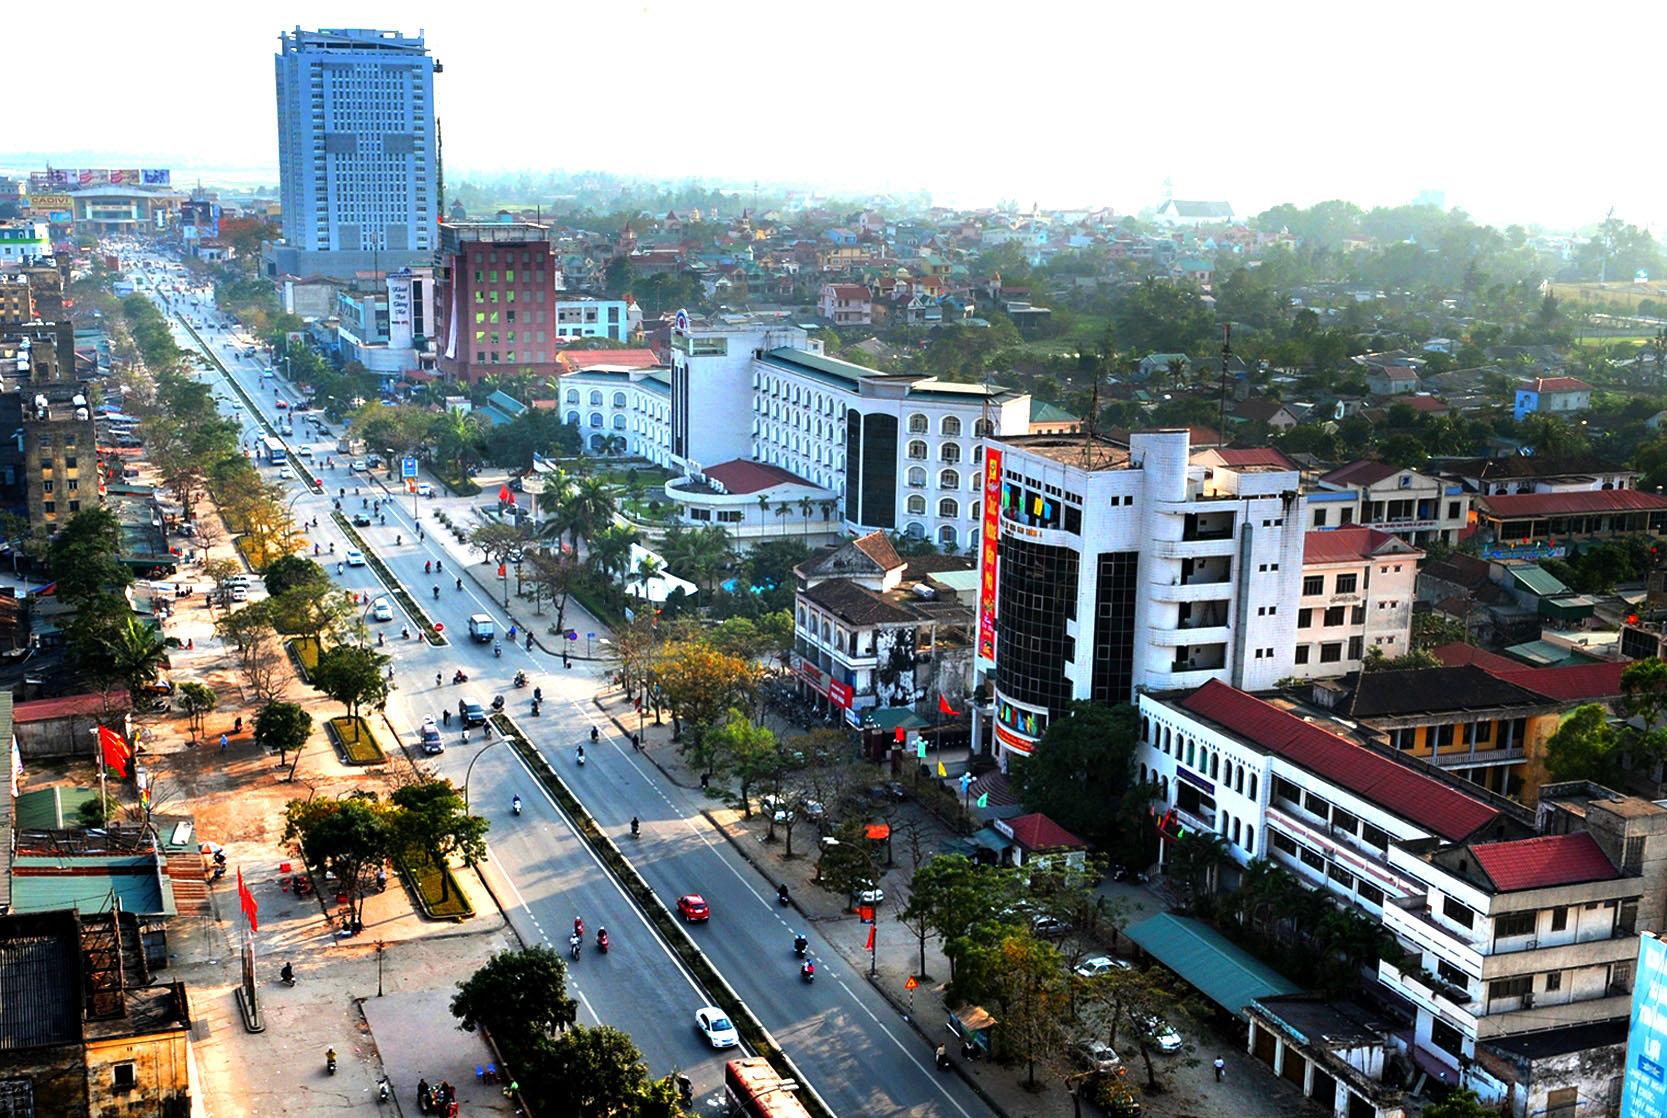 Vinh Vietnam  City pictures : vé máy bay đi Vinh Tìm kiếm Vé máy bay Vé máy bay giá ...